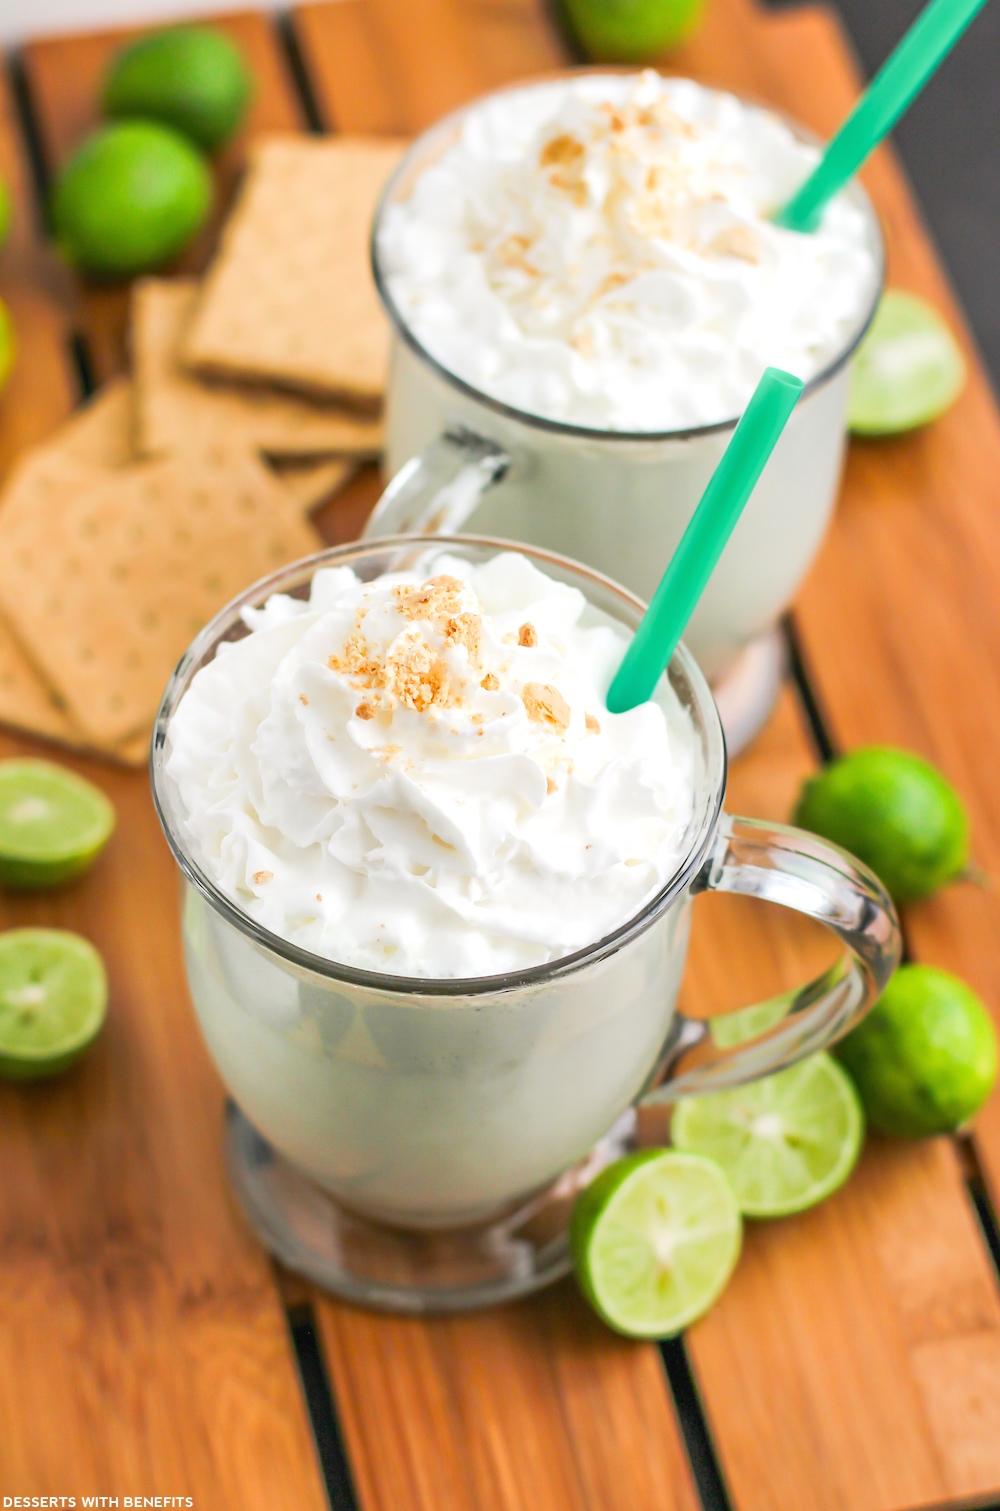 Healthy Key Lime Pie Milkshake (refined sugar free, low carb, high protein, gluten free) - Desserts with Benefits